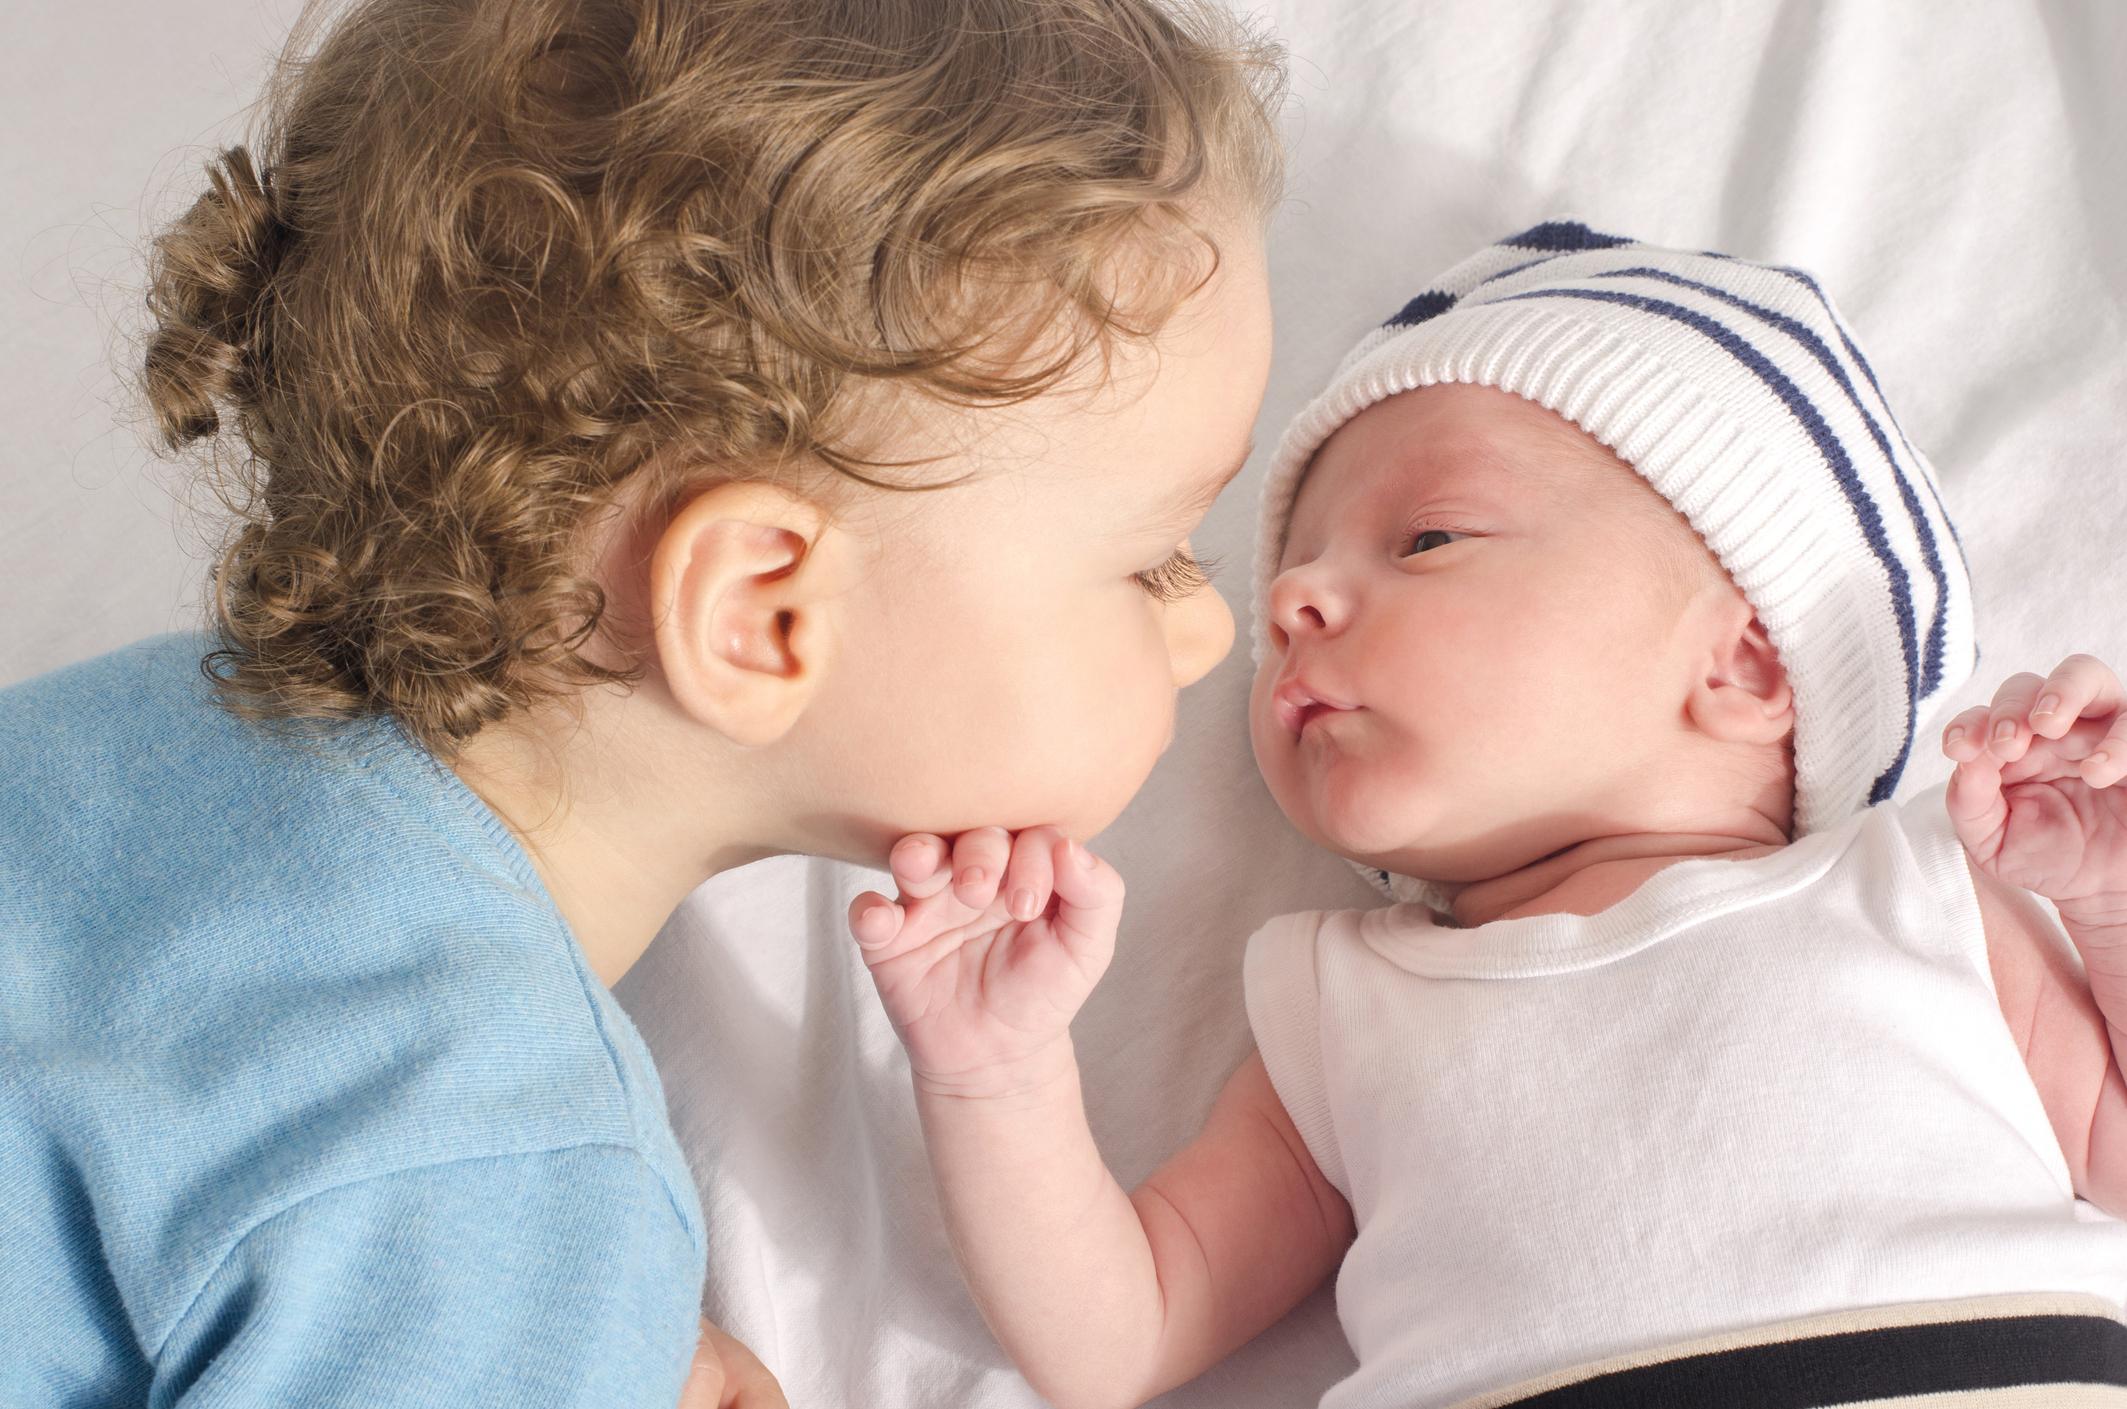 toddler and a newborn